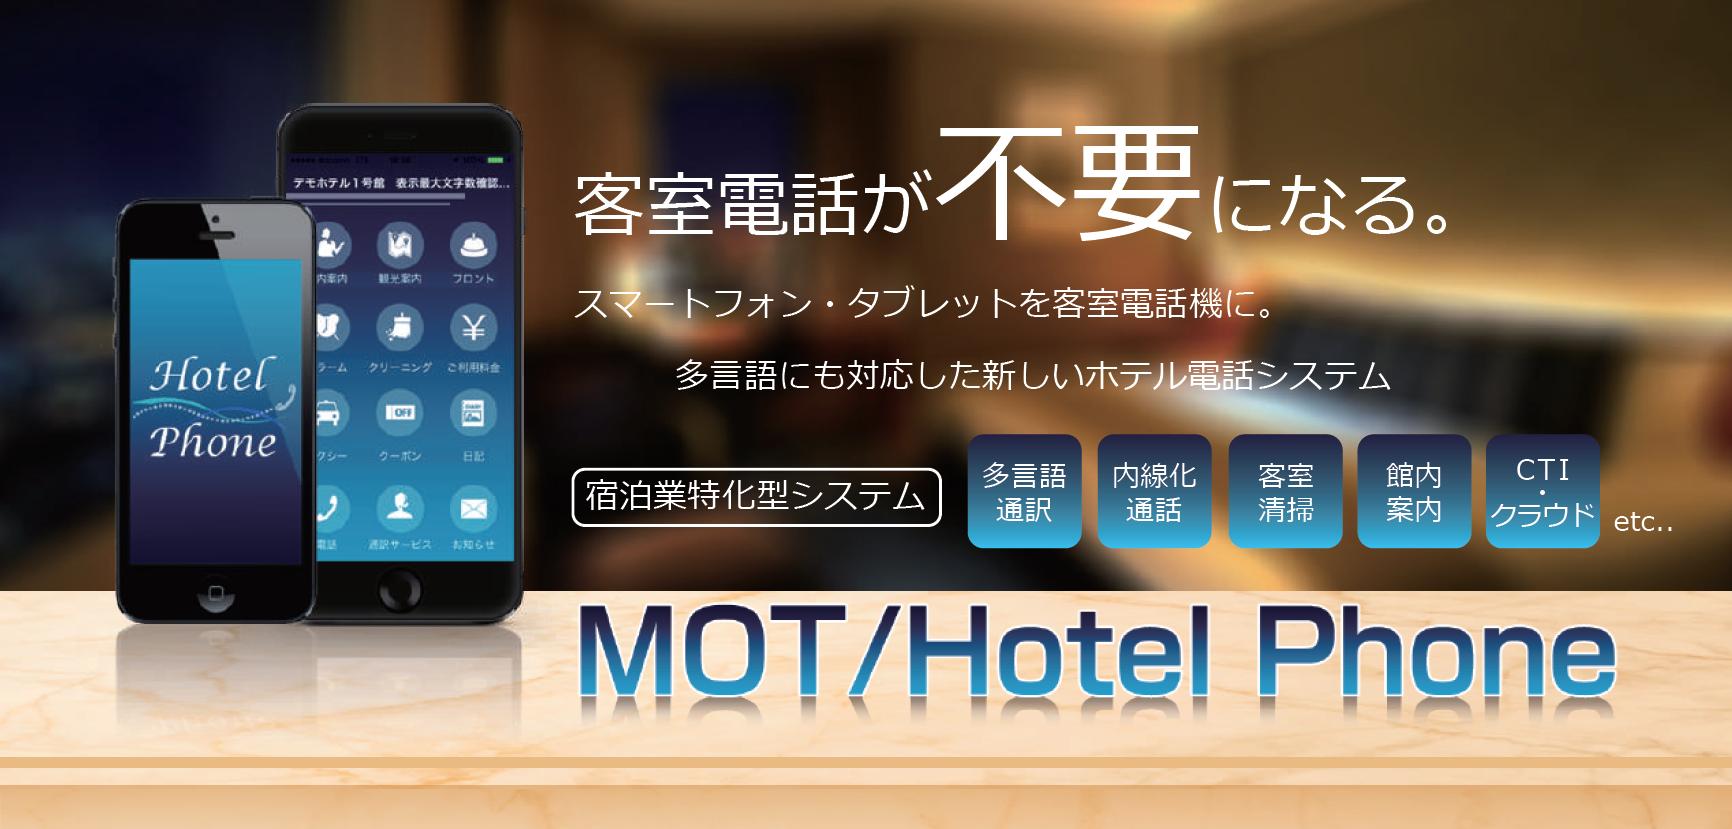 MOT/Hotel Phoneイメージ